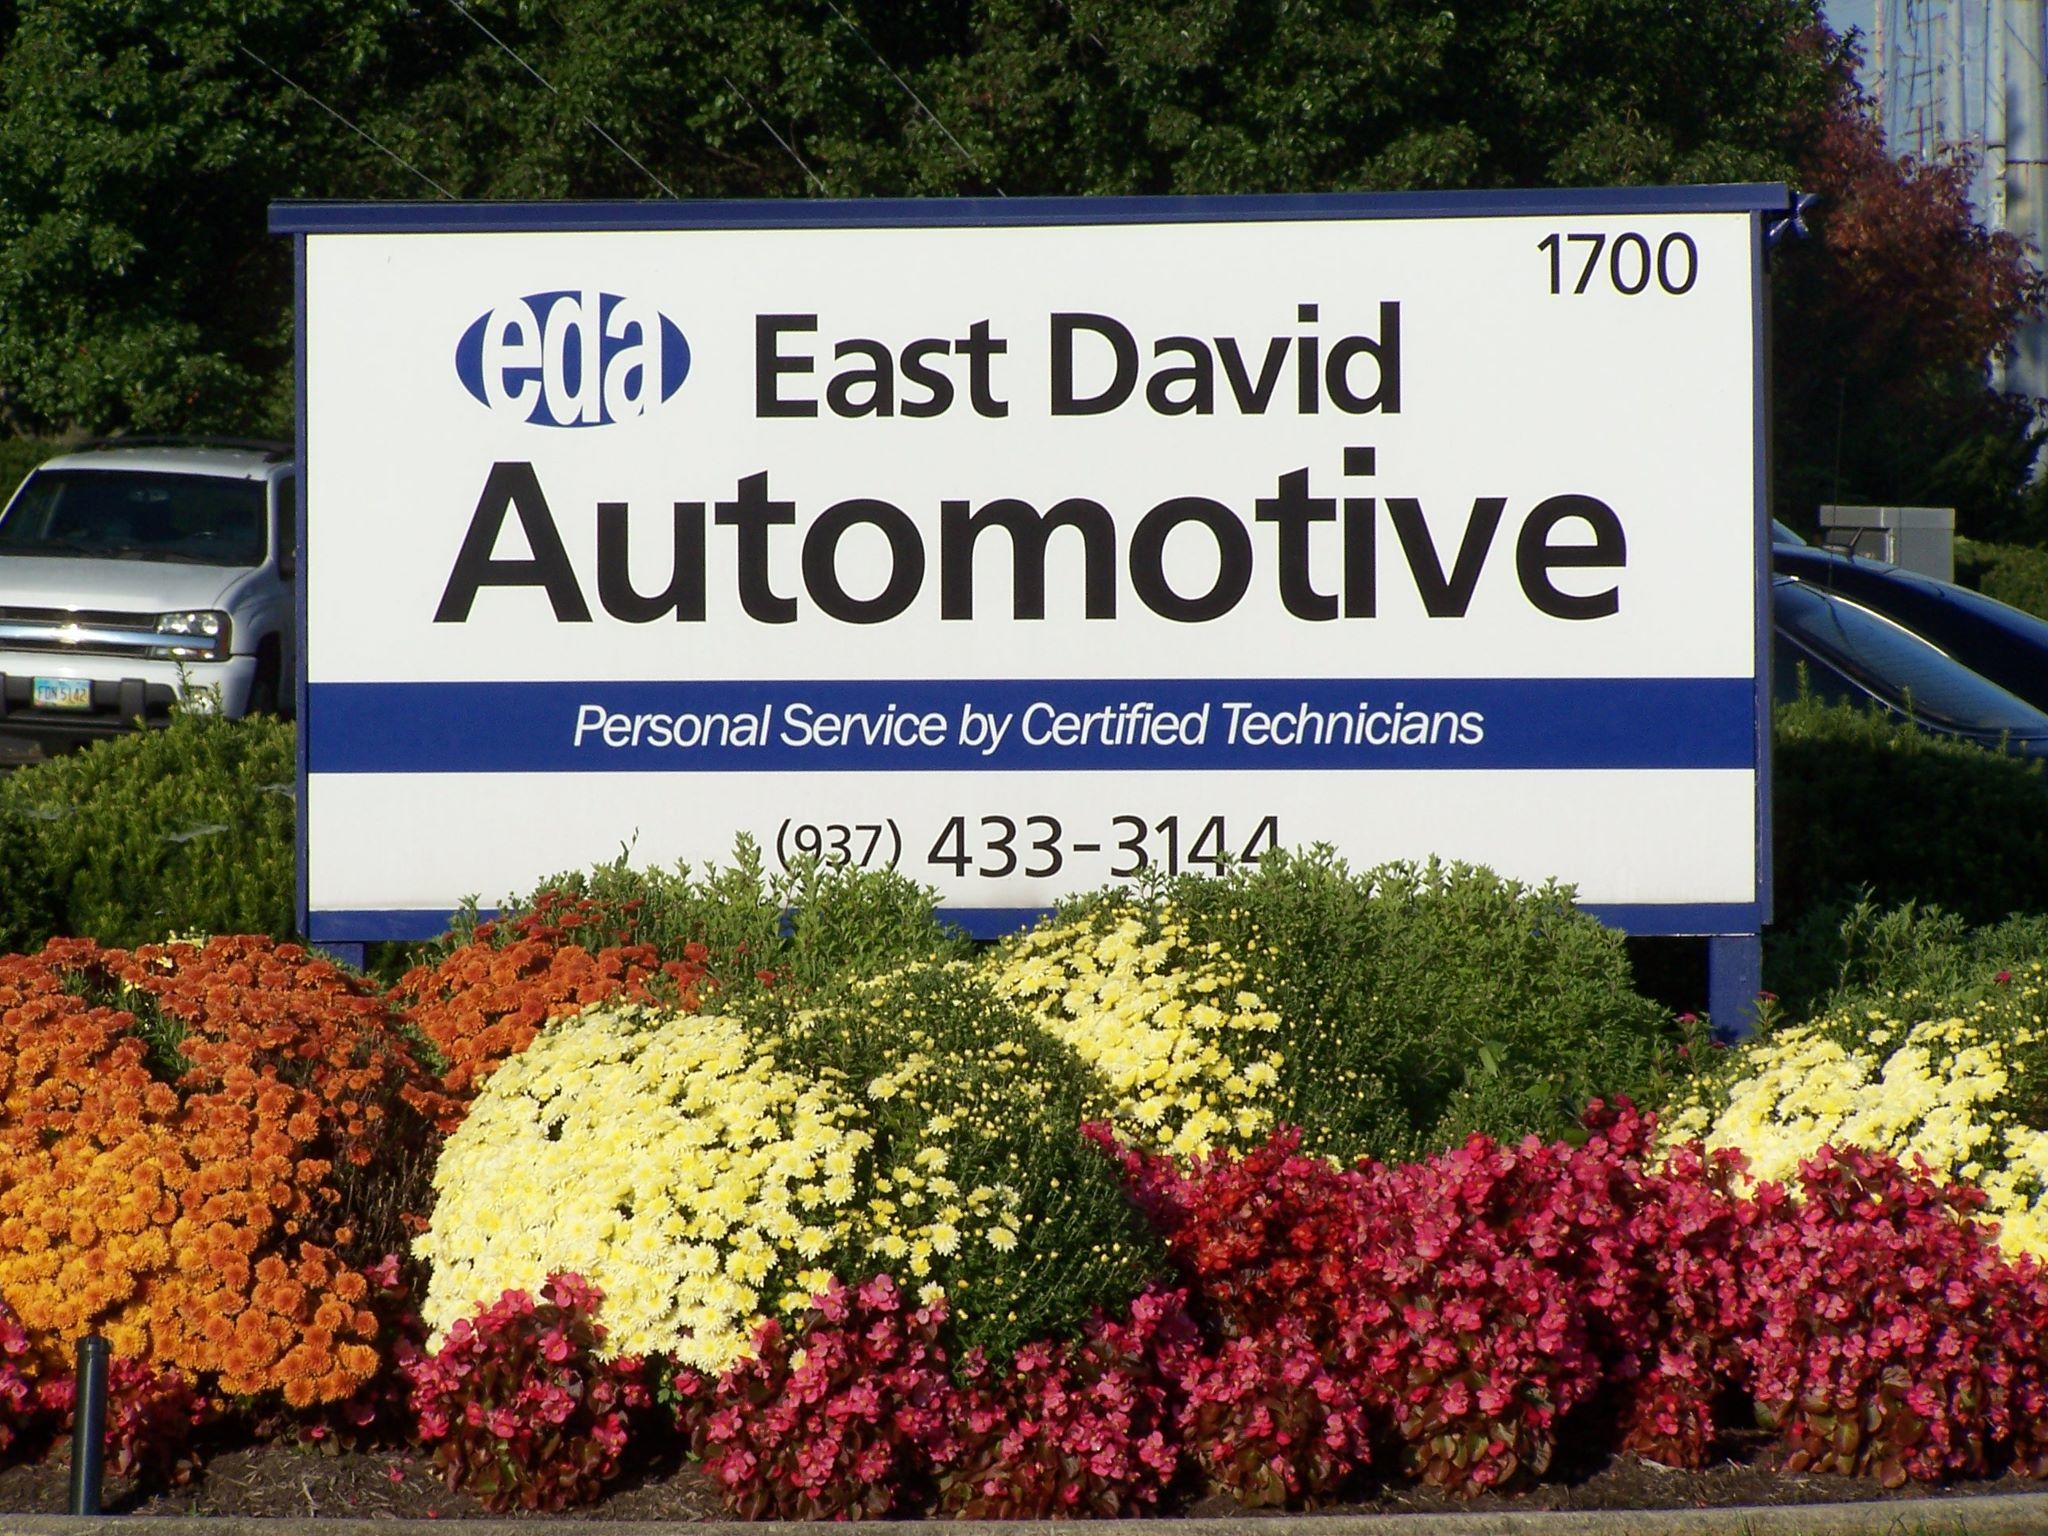 East David Automotive, Inc image 1